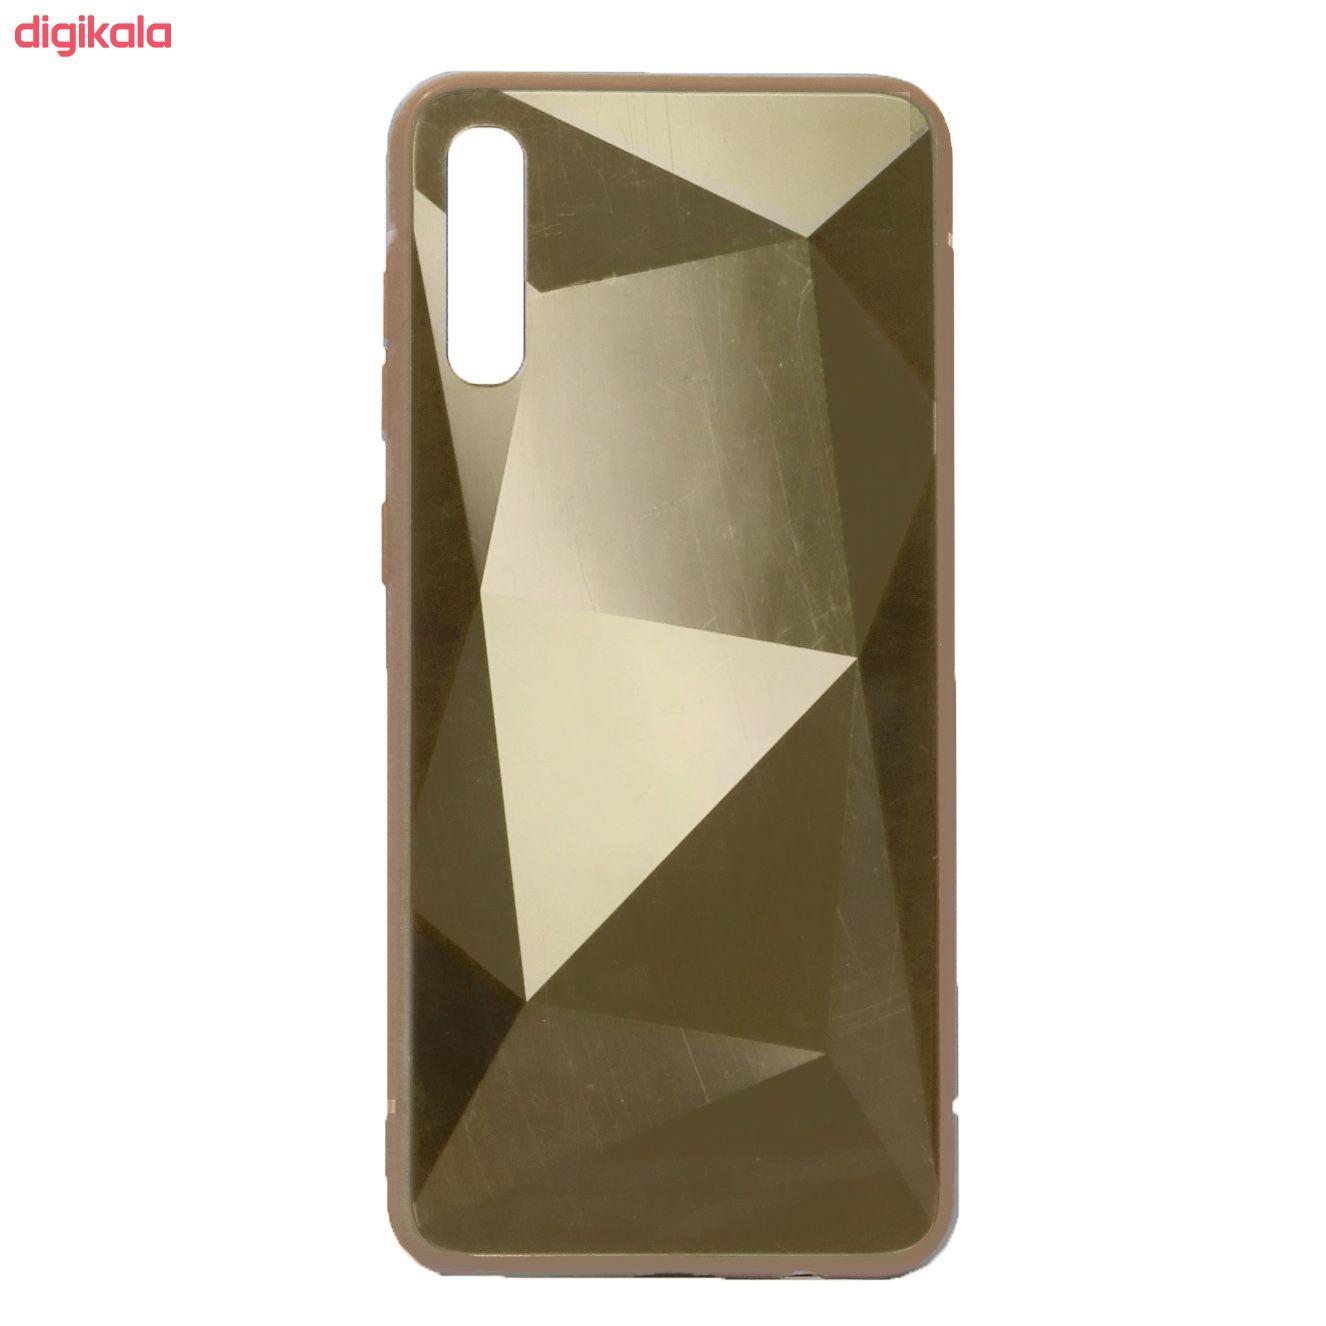 کاور طرح الماس مدل mr-506 مناسب برای گوشی موبایل سامسونگ Galaxy A50/A50s/a30s main 1 3